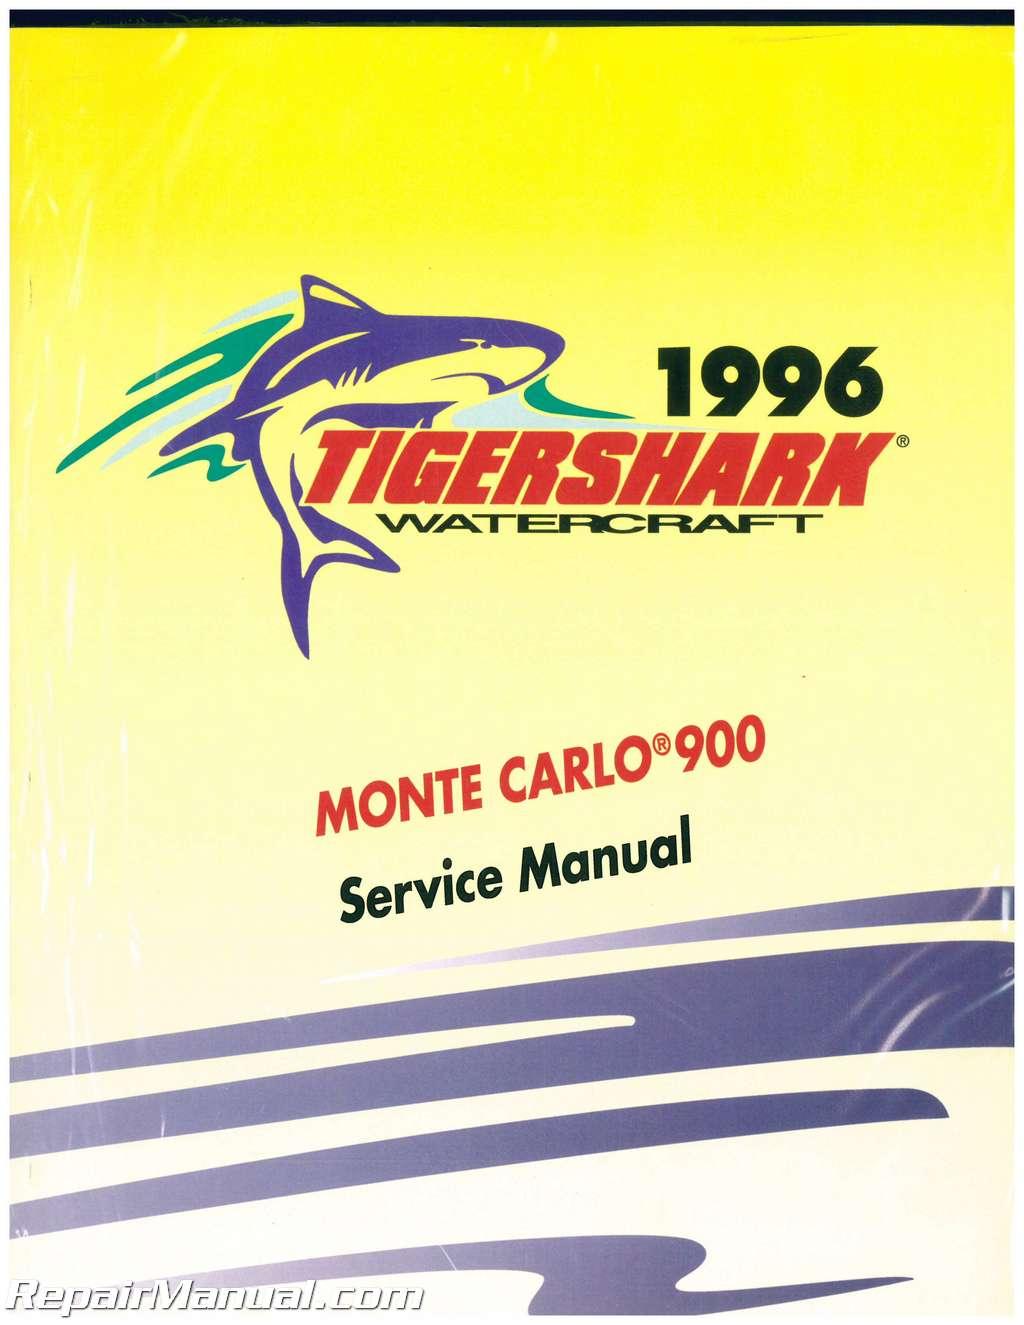 Tigershark Daytona Manual Auto Electrical Wiring Diagram 1995 Chrysler Lebaron Fuse Schematic Repair 1994 Pwc Manuals